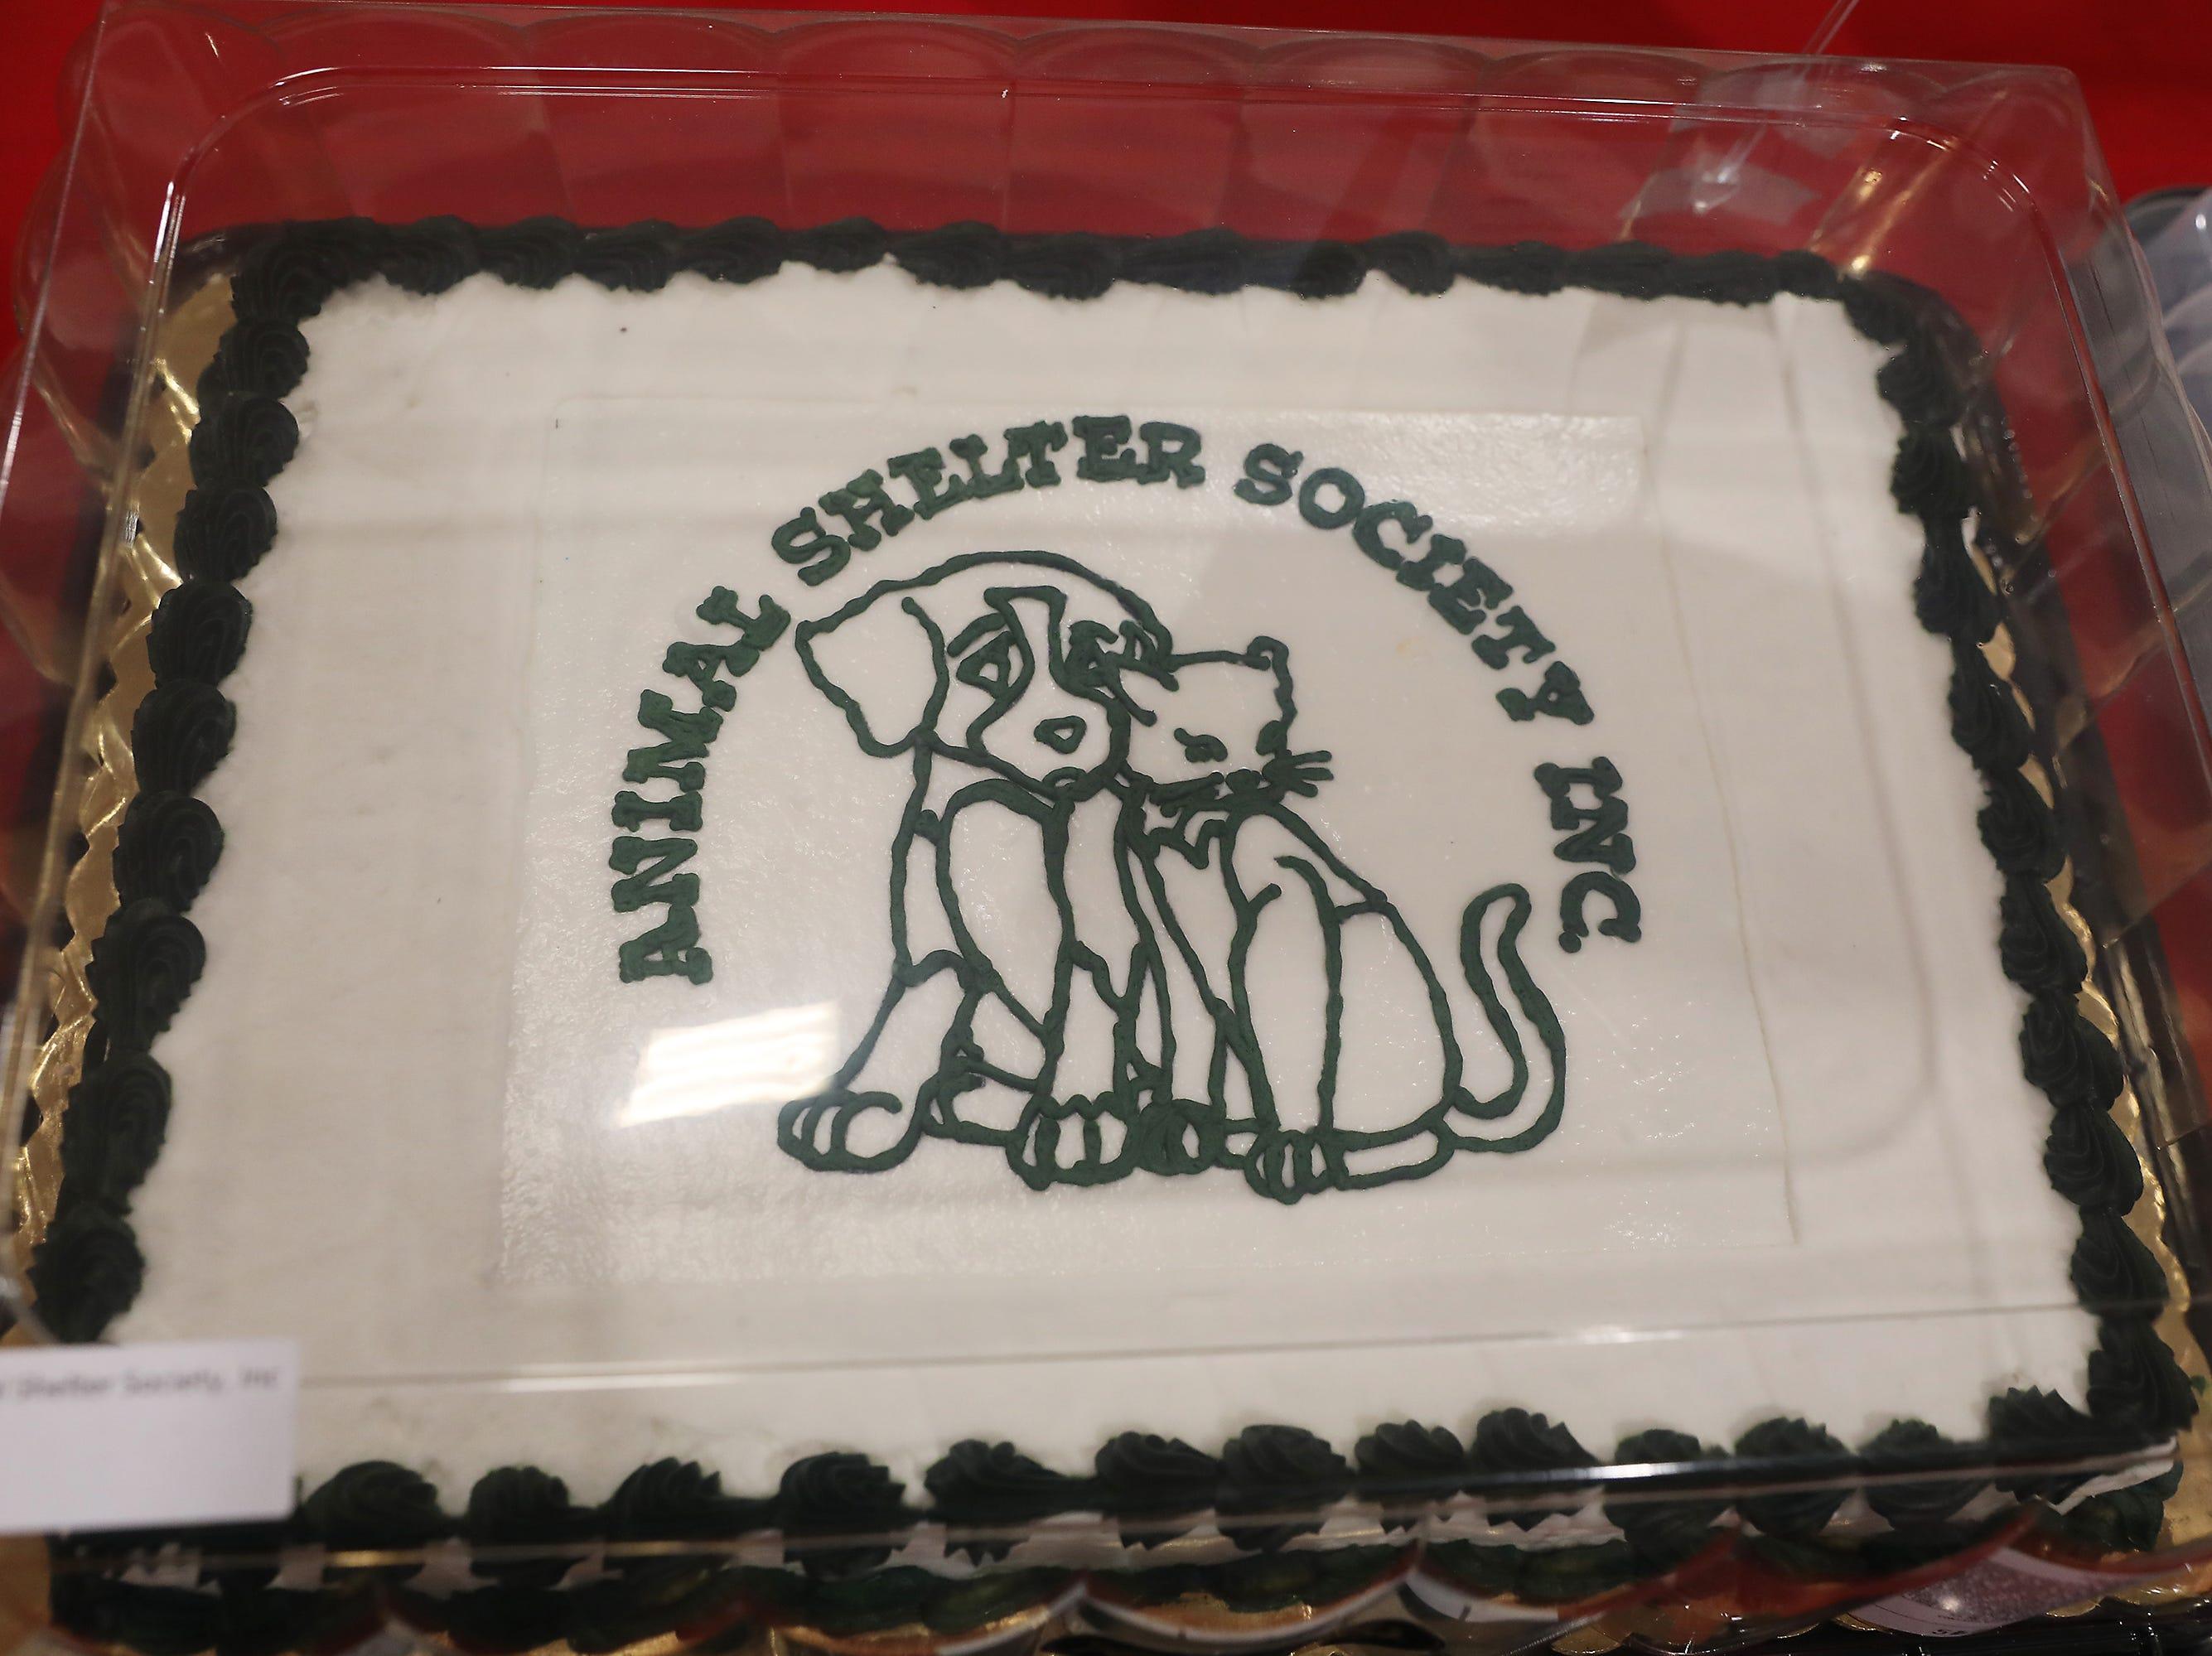 2:15 P.M. Thursday cake 123 Animal Shelter Society - 1 adoption, bag of food; $150